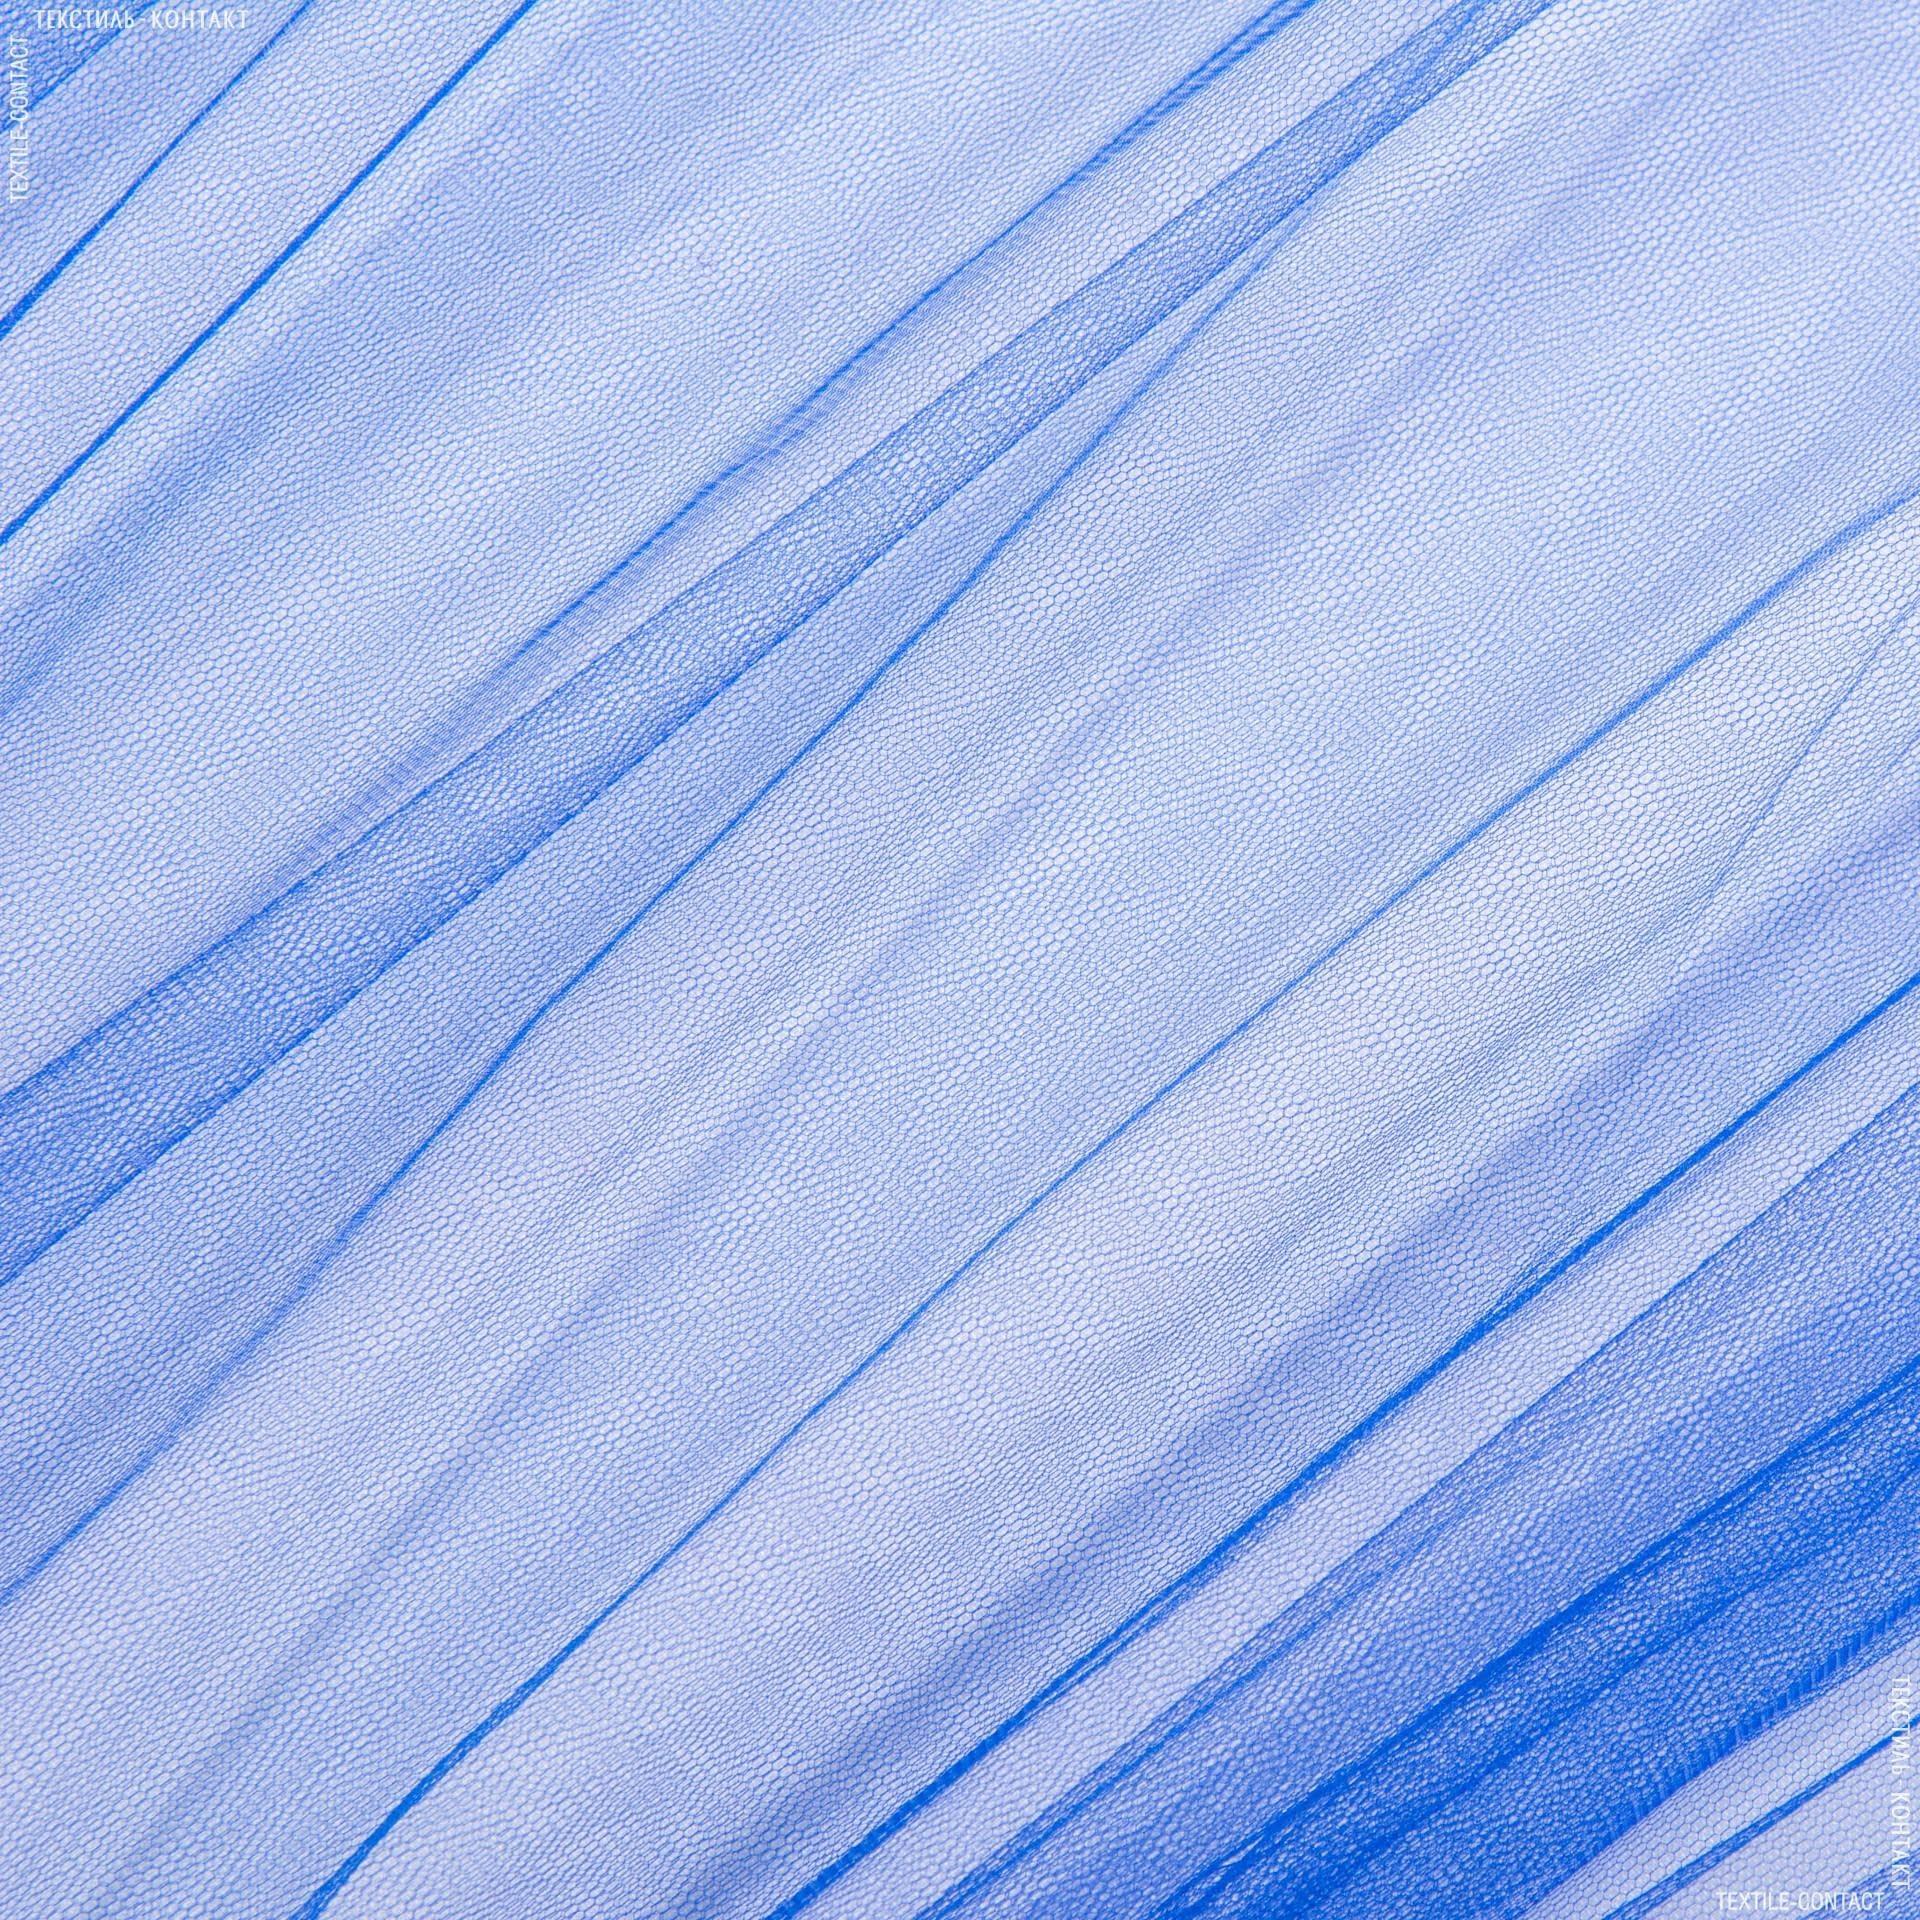 Ткани для платьев - Фатин мягкий электрик